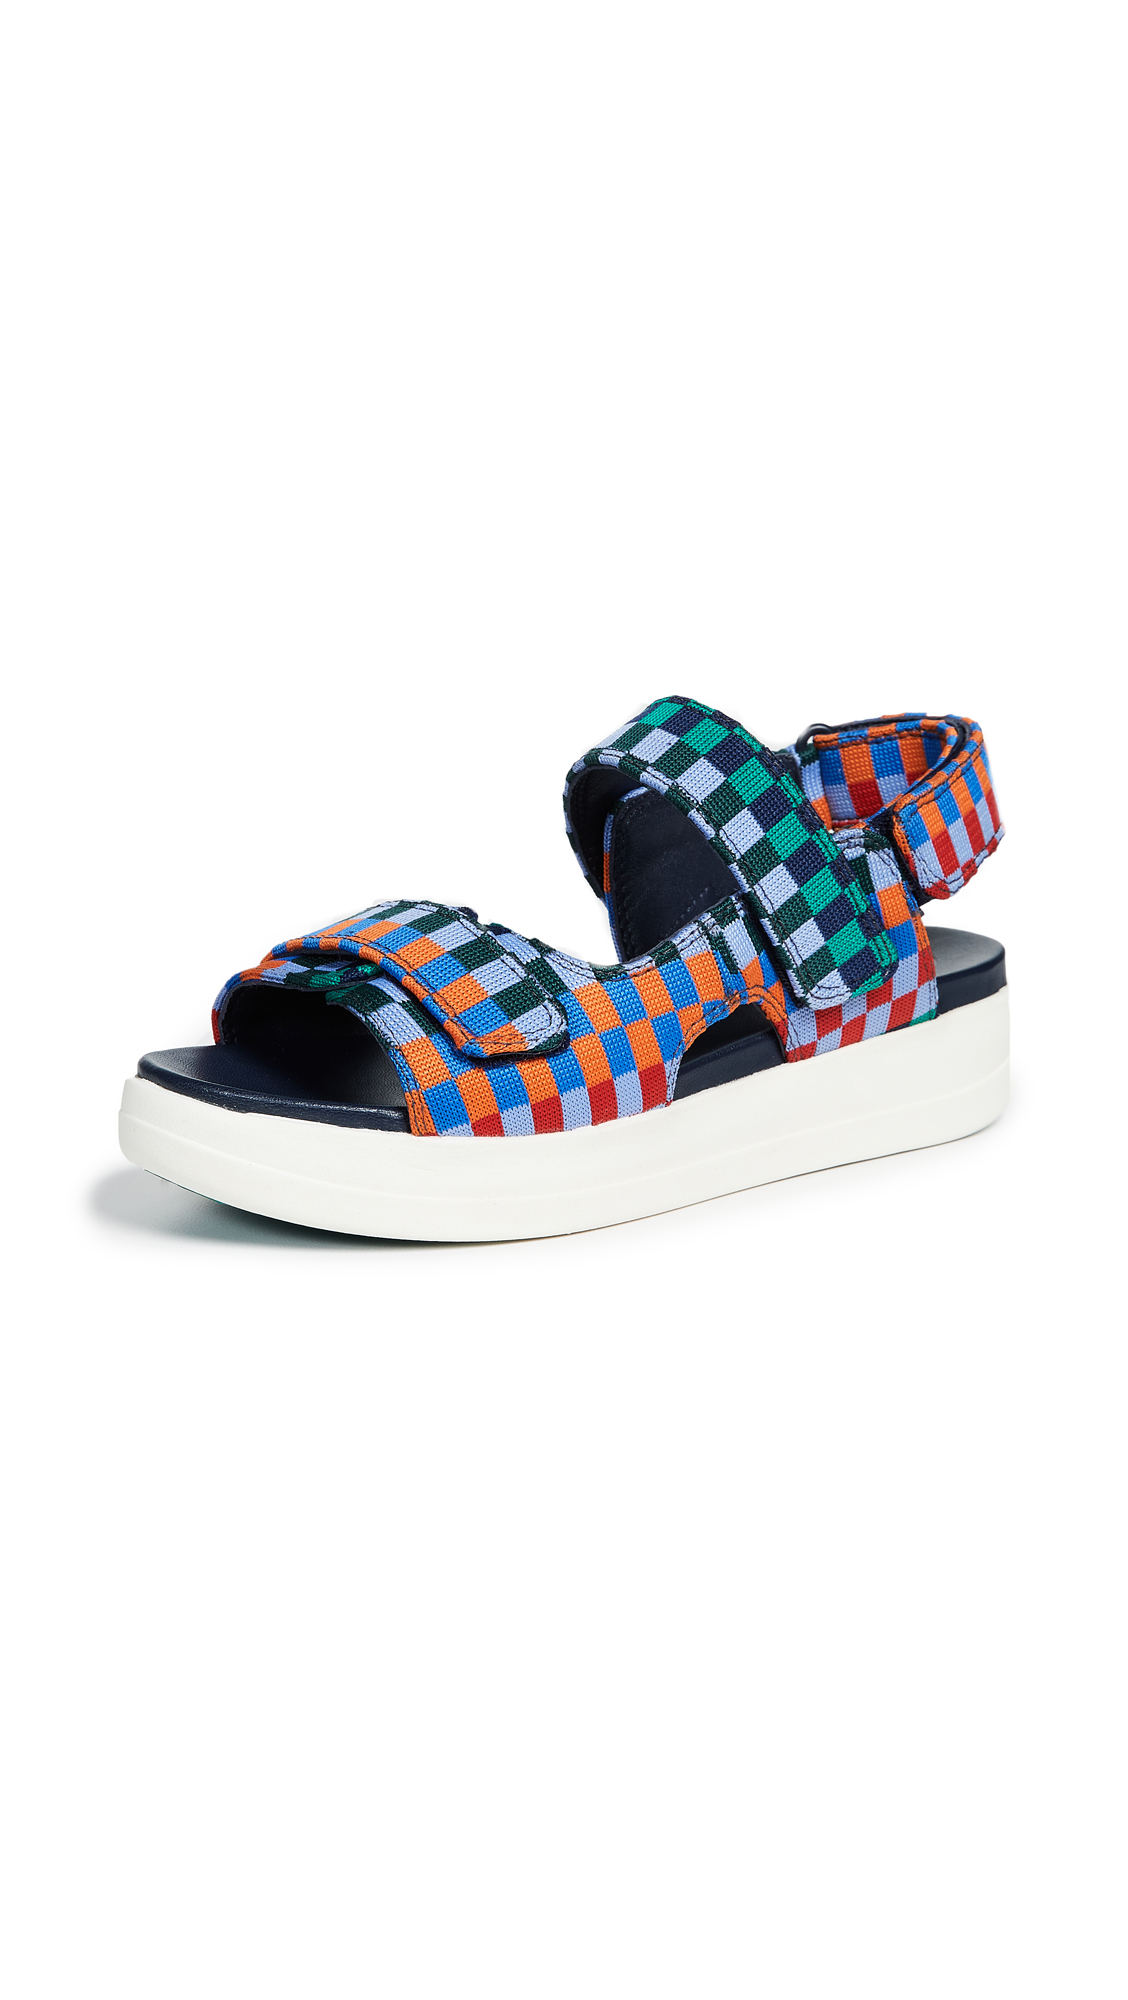 Tory Sport Check Print Flatform Sandals - Multi Check